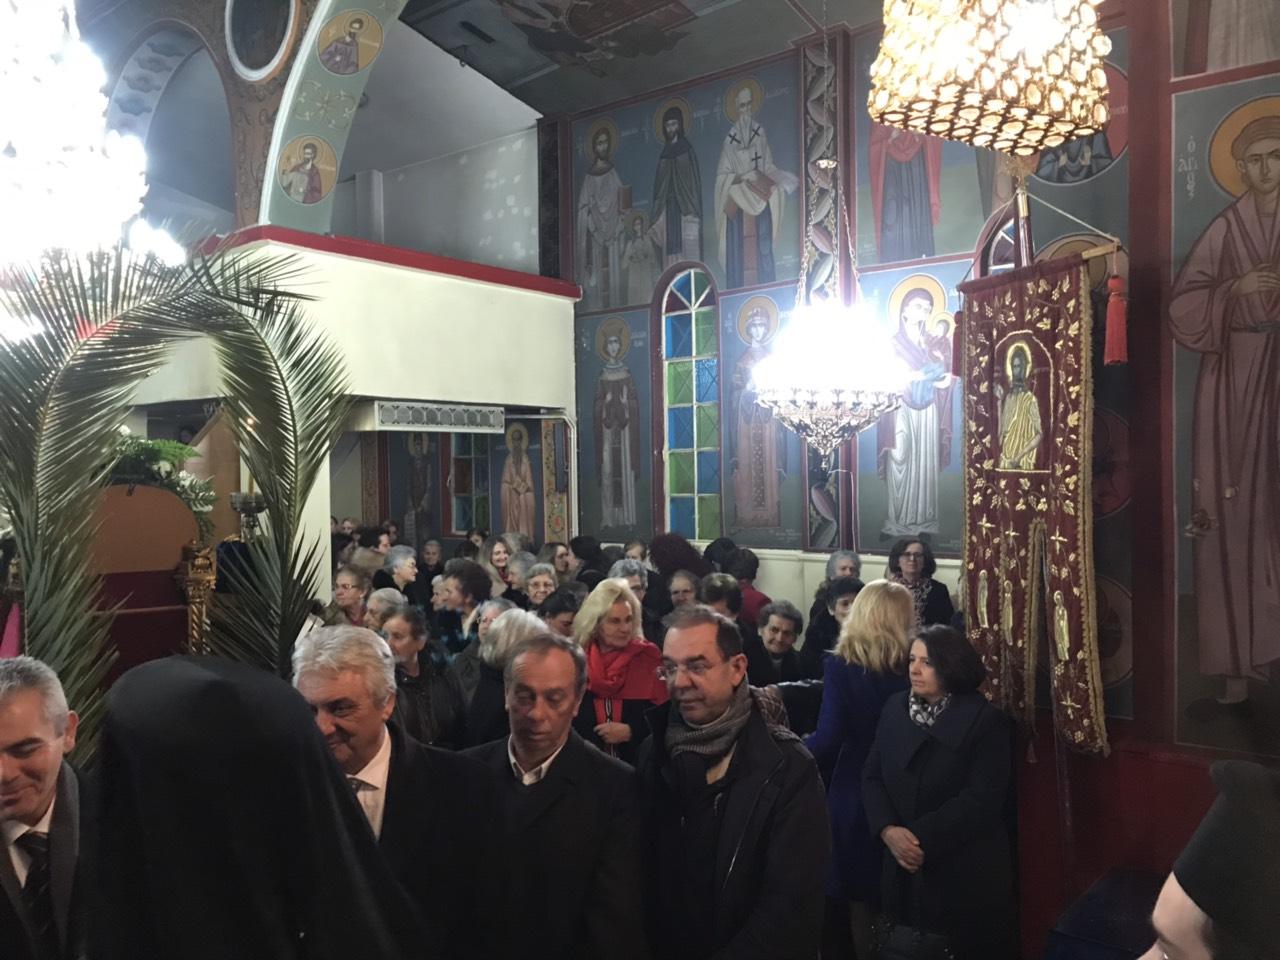 EspTimProdromou kaloxwri 6 - Στον πανηγυρικό εσπερινό του Αγίου Ιωάννου Προδρόμου Καλοχωρίου ο Σεβασμιώτατος